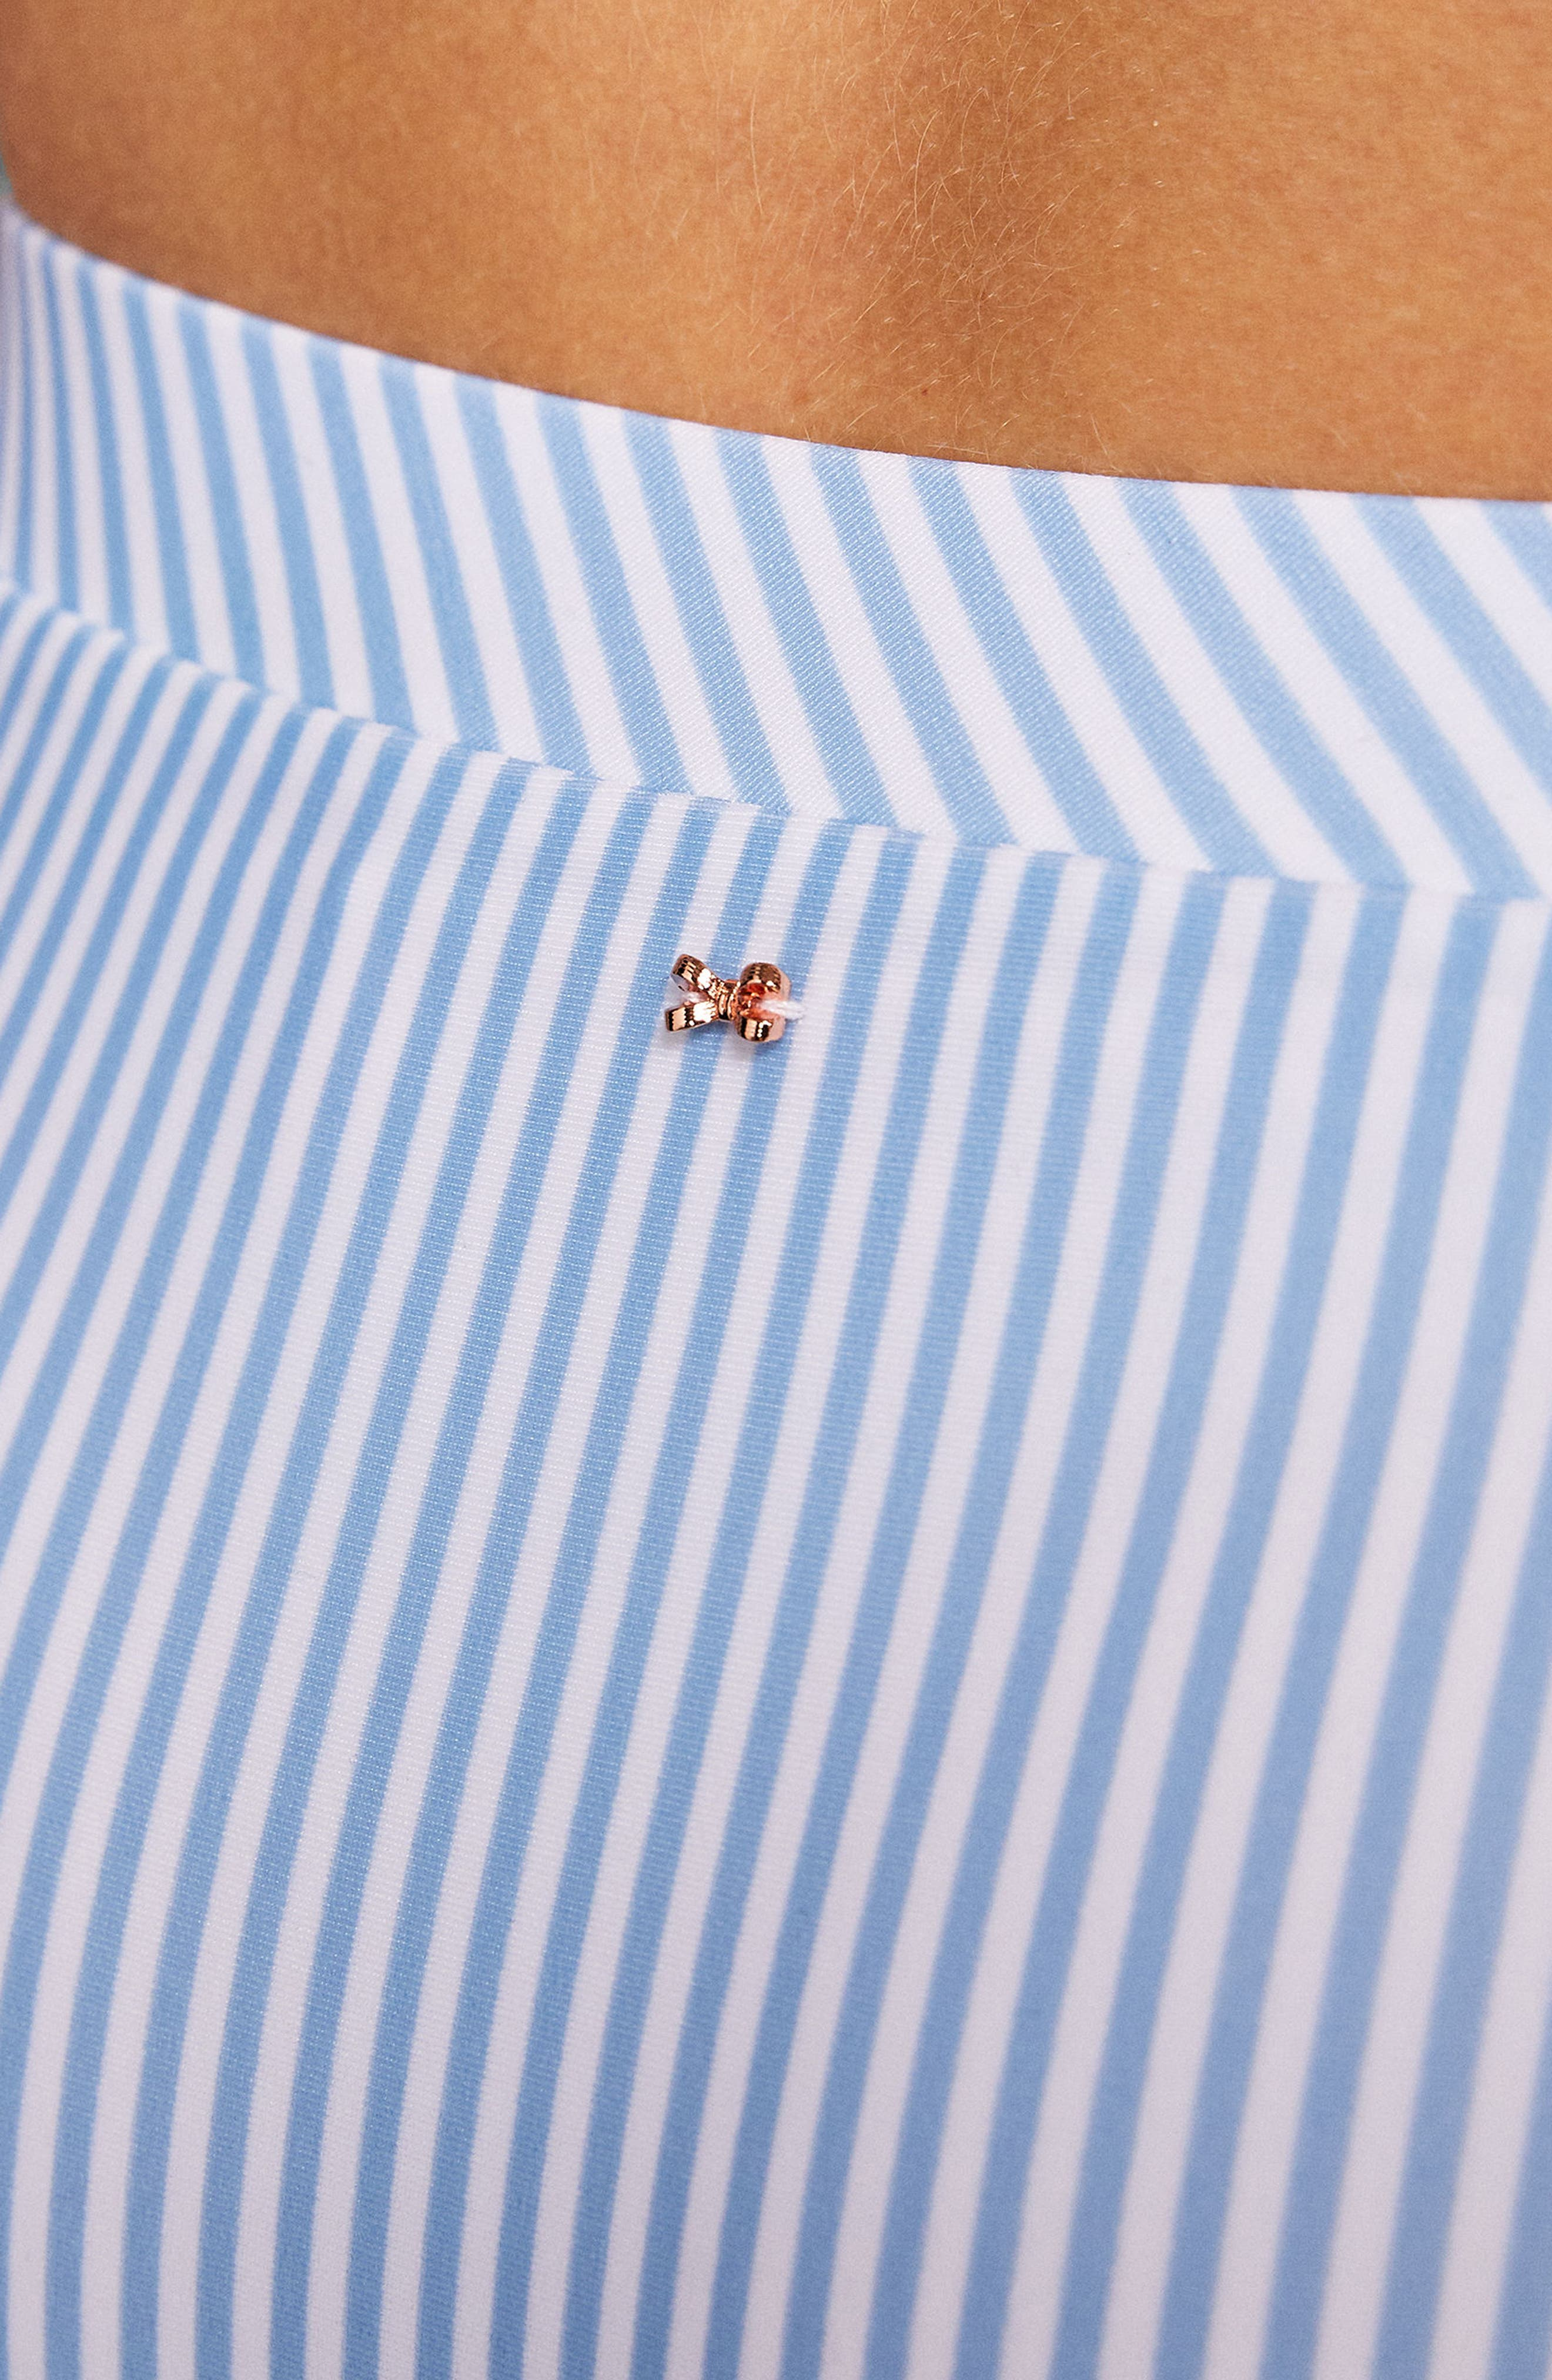 Stripe Bikini Bottoms,                             Alternate thumbnail 3, color,                             Pale Blue